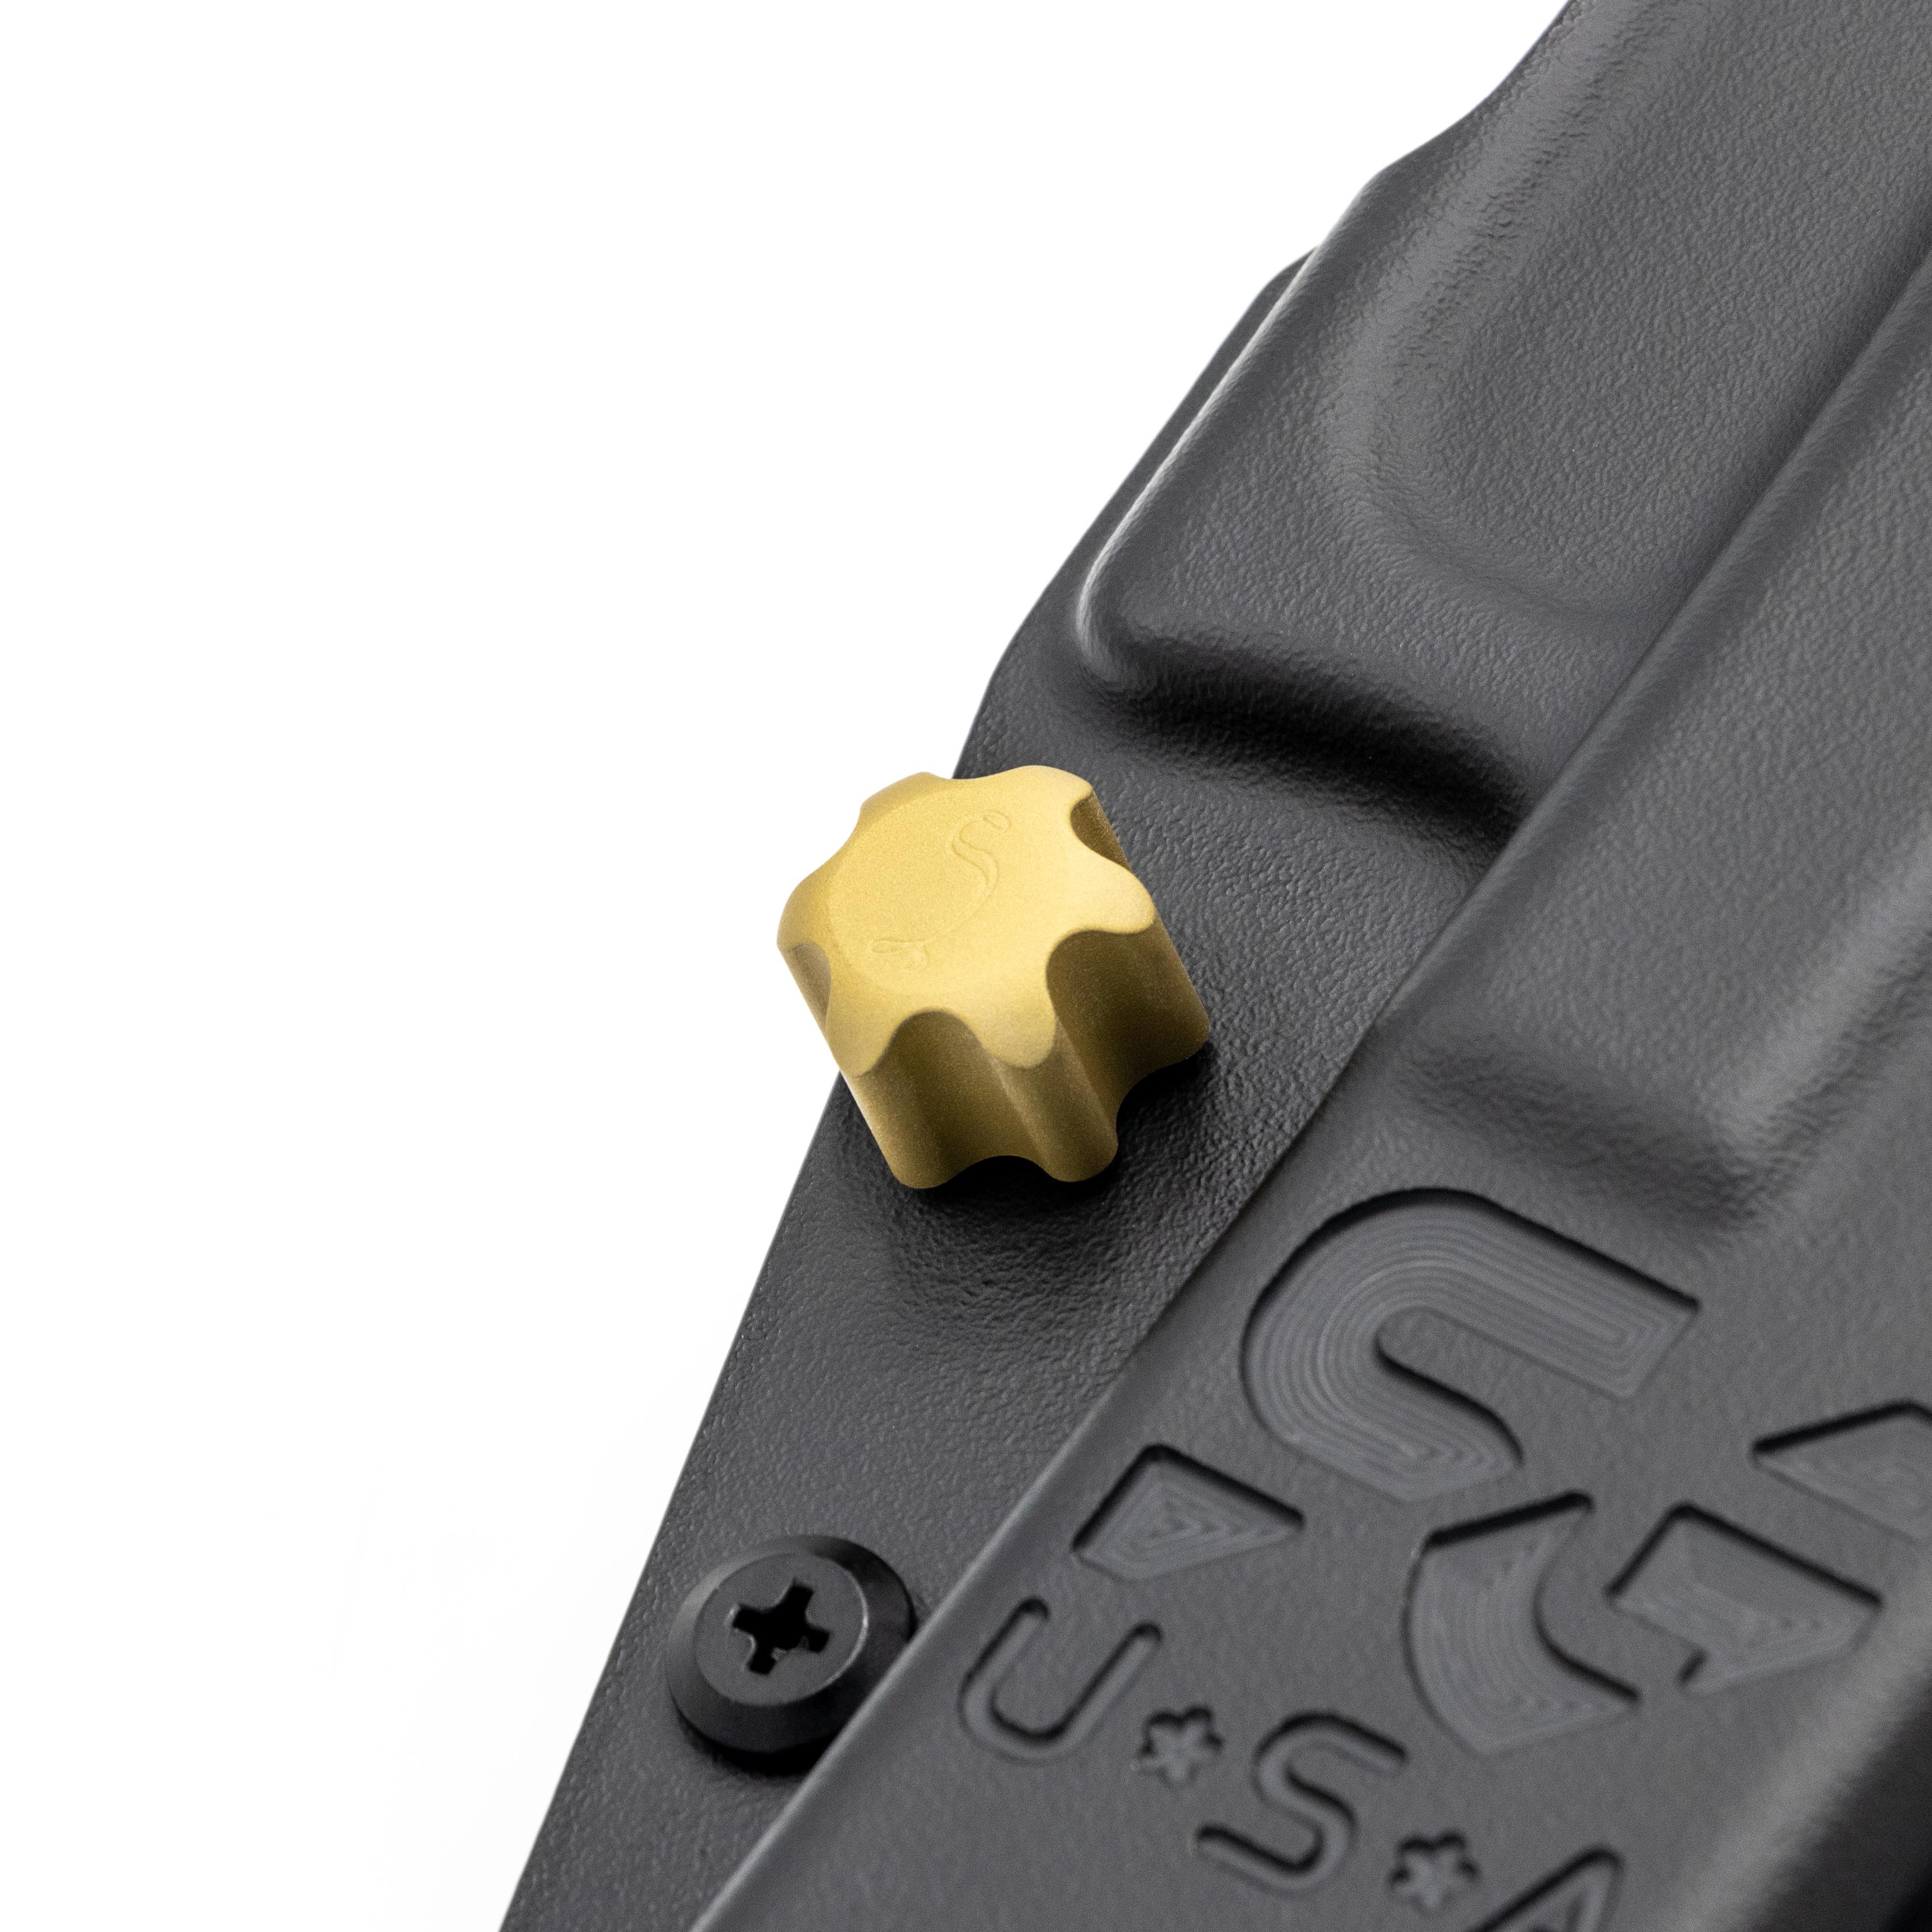 stealthgearusa-sgx-competition-holster-bolt-gold-20210423-three-quarter-shot.jpg